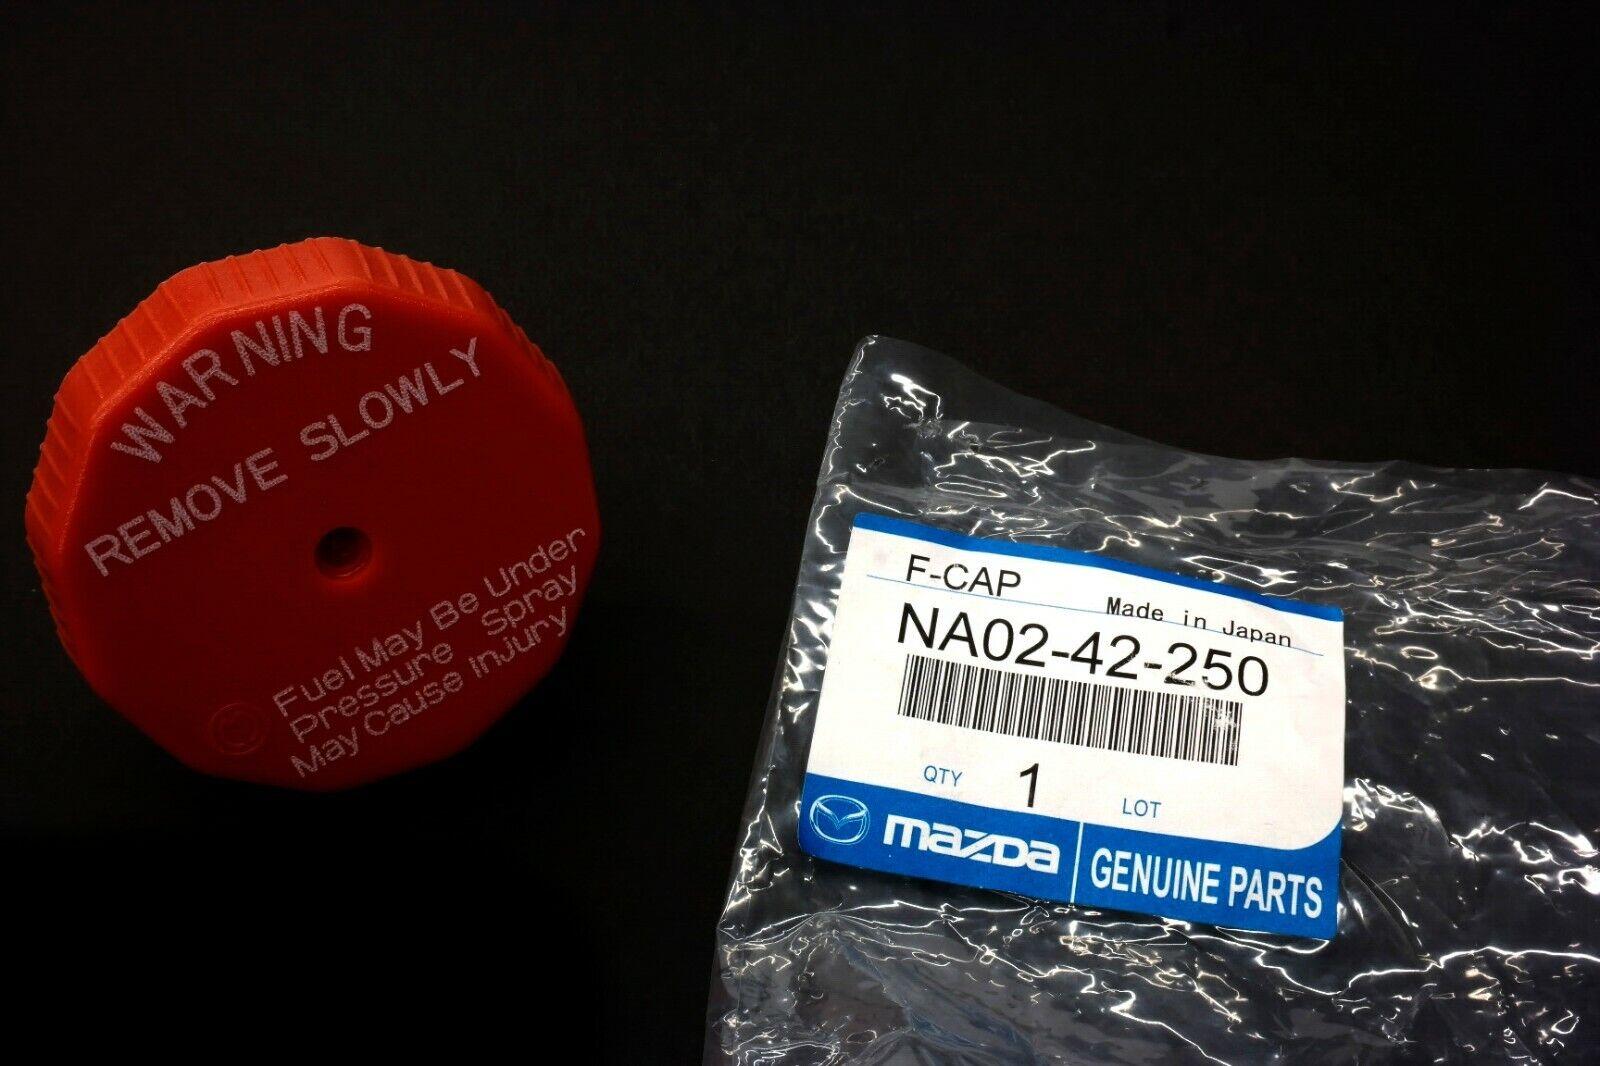 Genuine 1990-1995 Mazda Miata Fuel Cap NA02-42-250